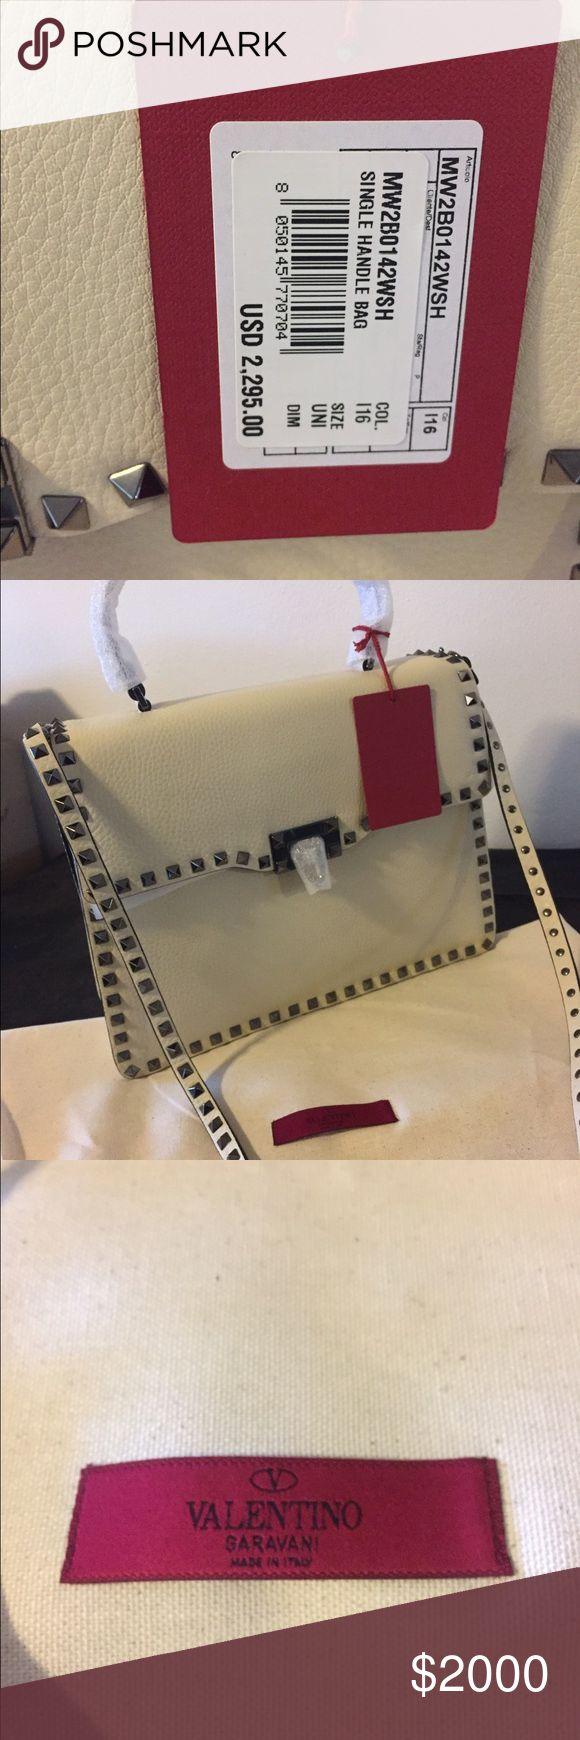 "Valentino Garavani Ivory ""Medium Rockstud Tote"" Valentino Garavani Ivory Leather ""Medium Rockstud Tote"" Bag 100% authentic Valentino Bags Totes"